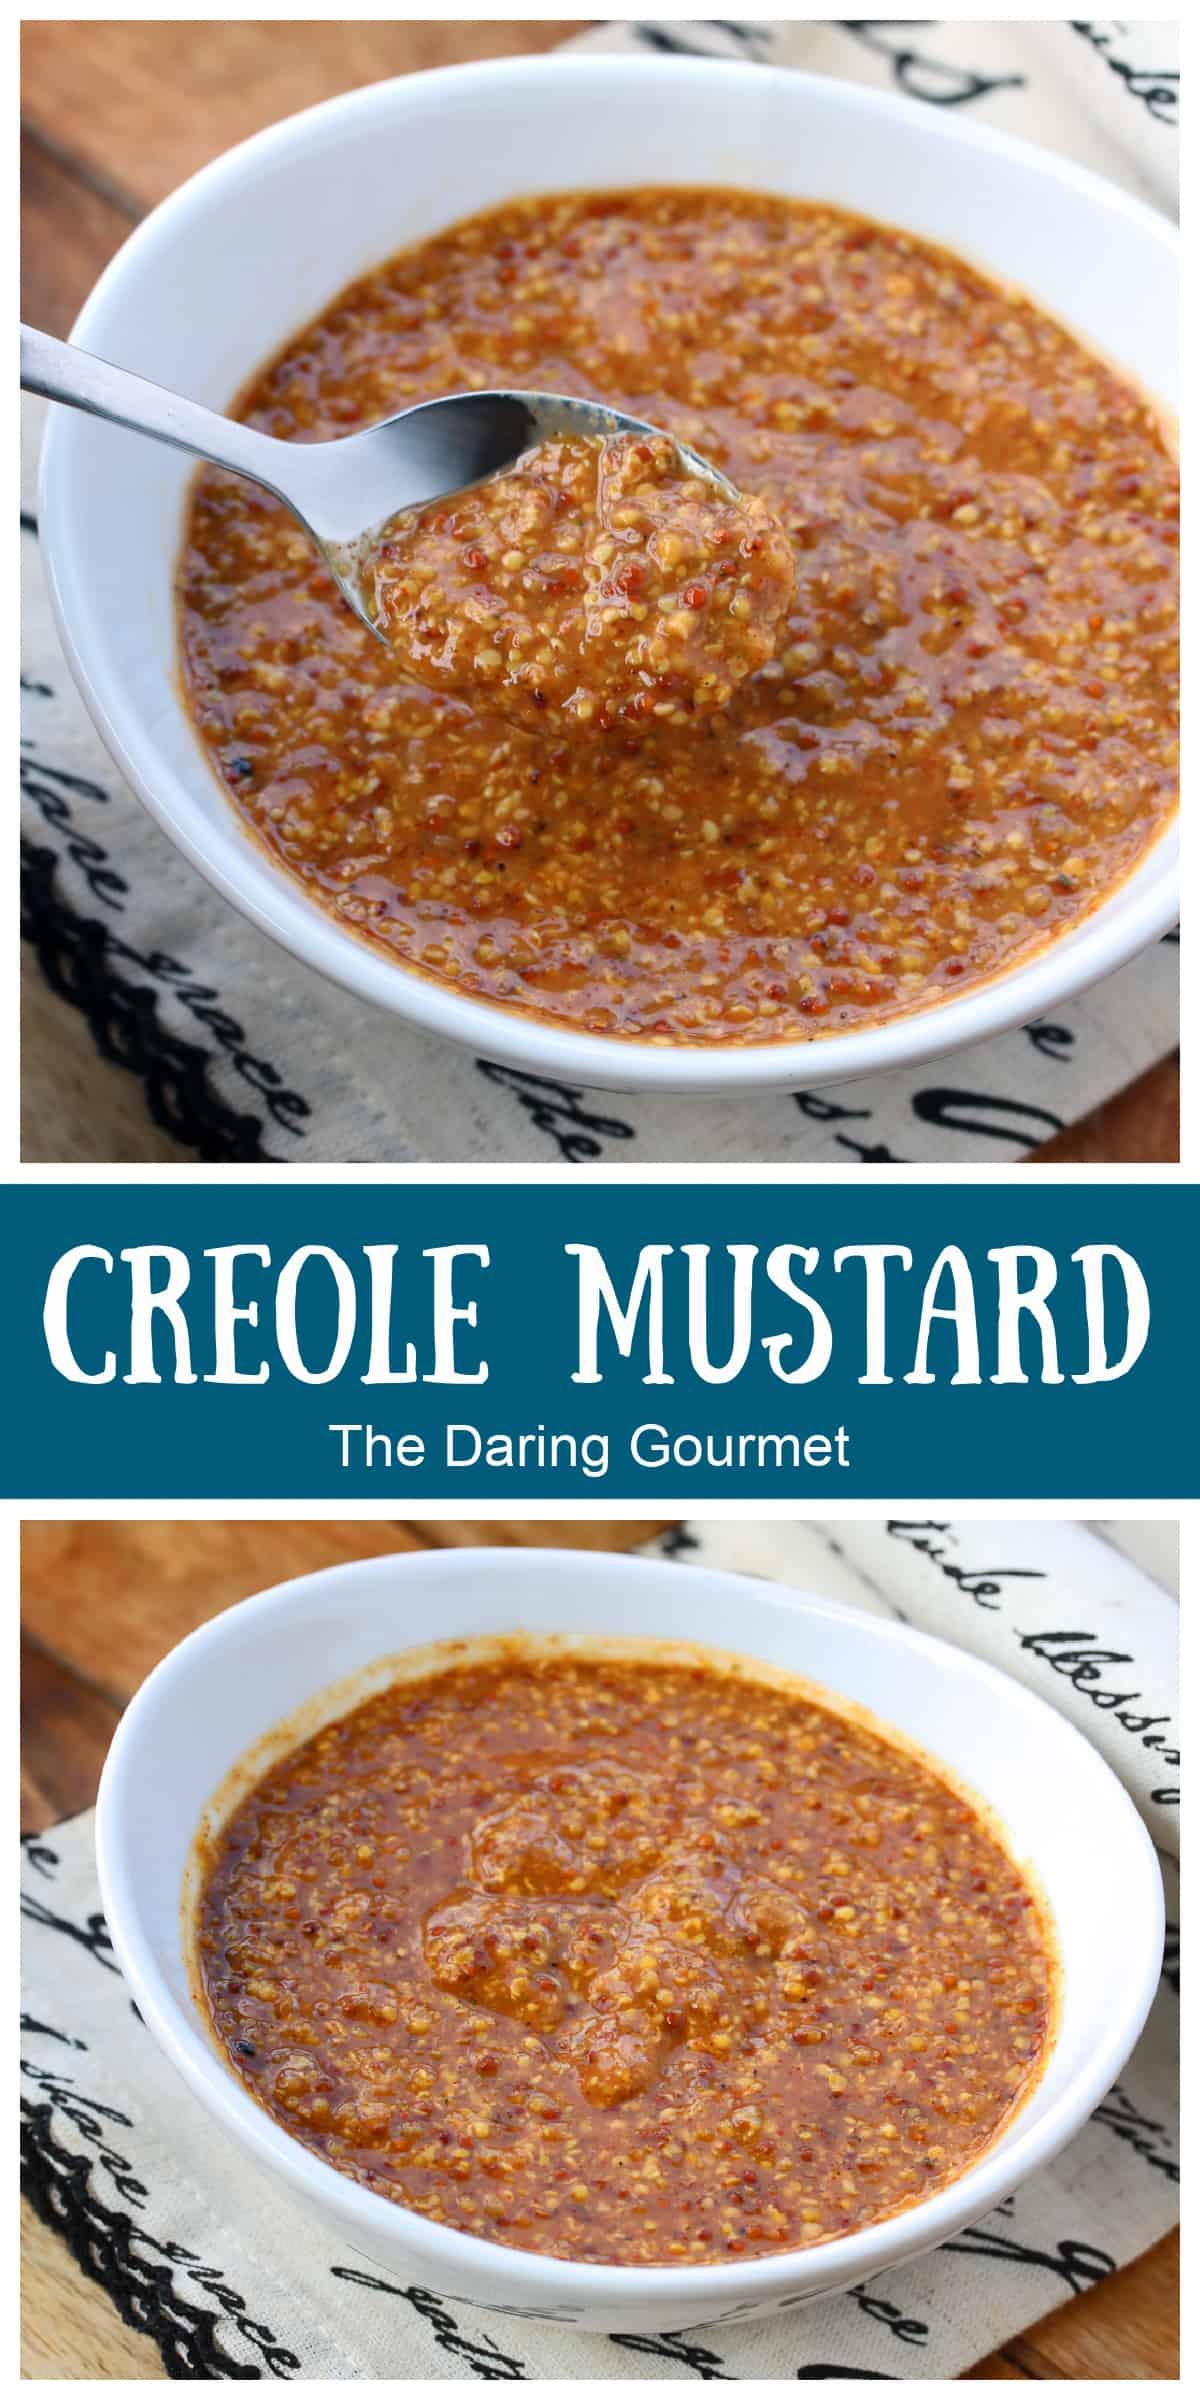 creole mustard recipe cajun spicy molasses white wine vinegar dipping sauce